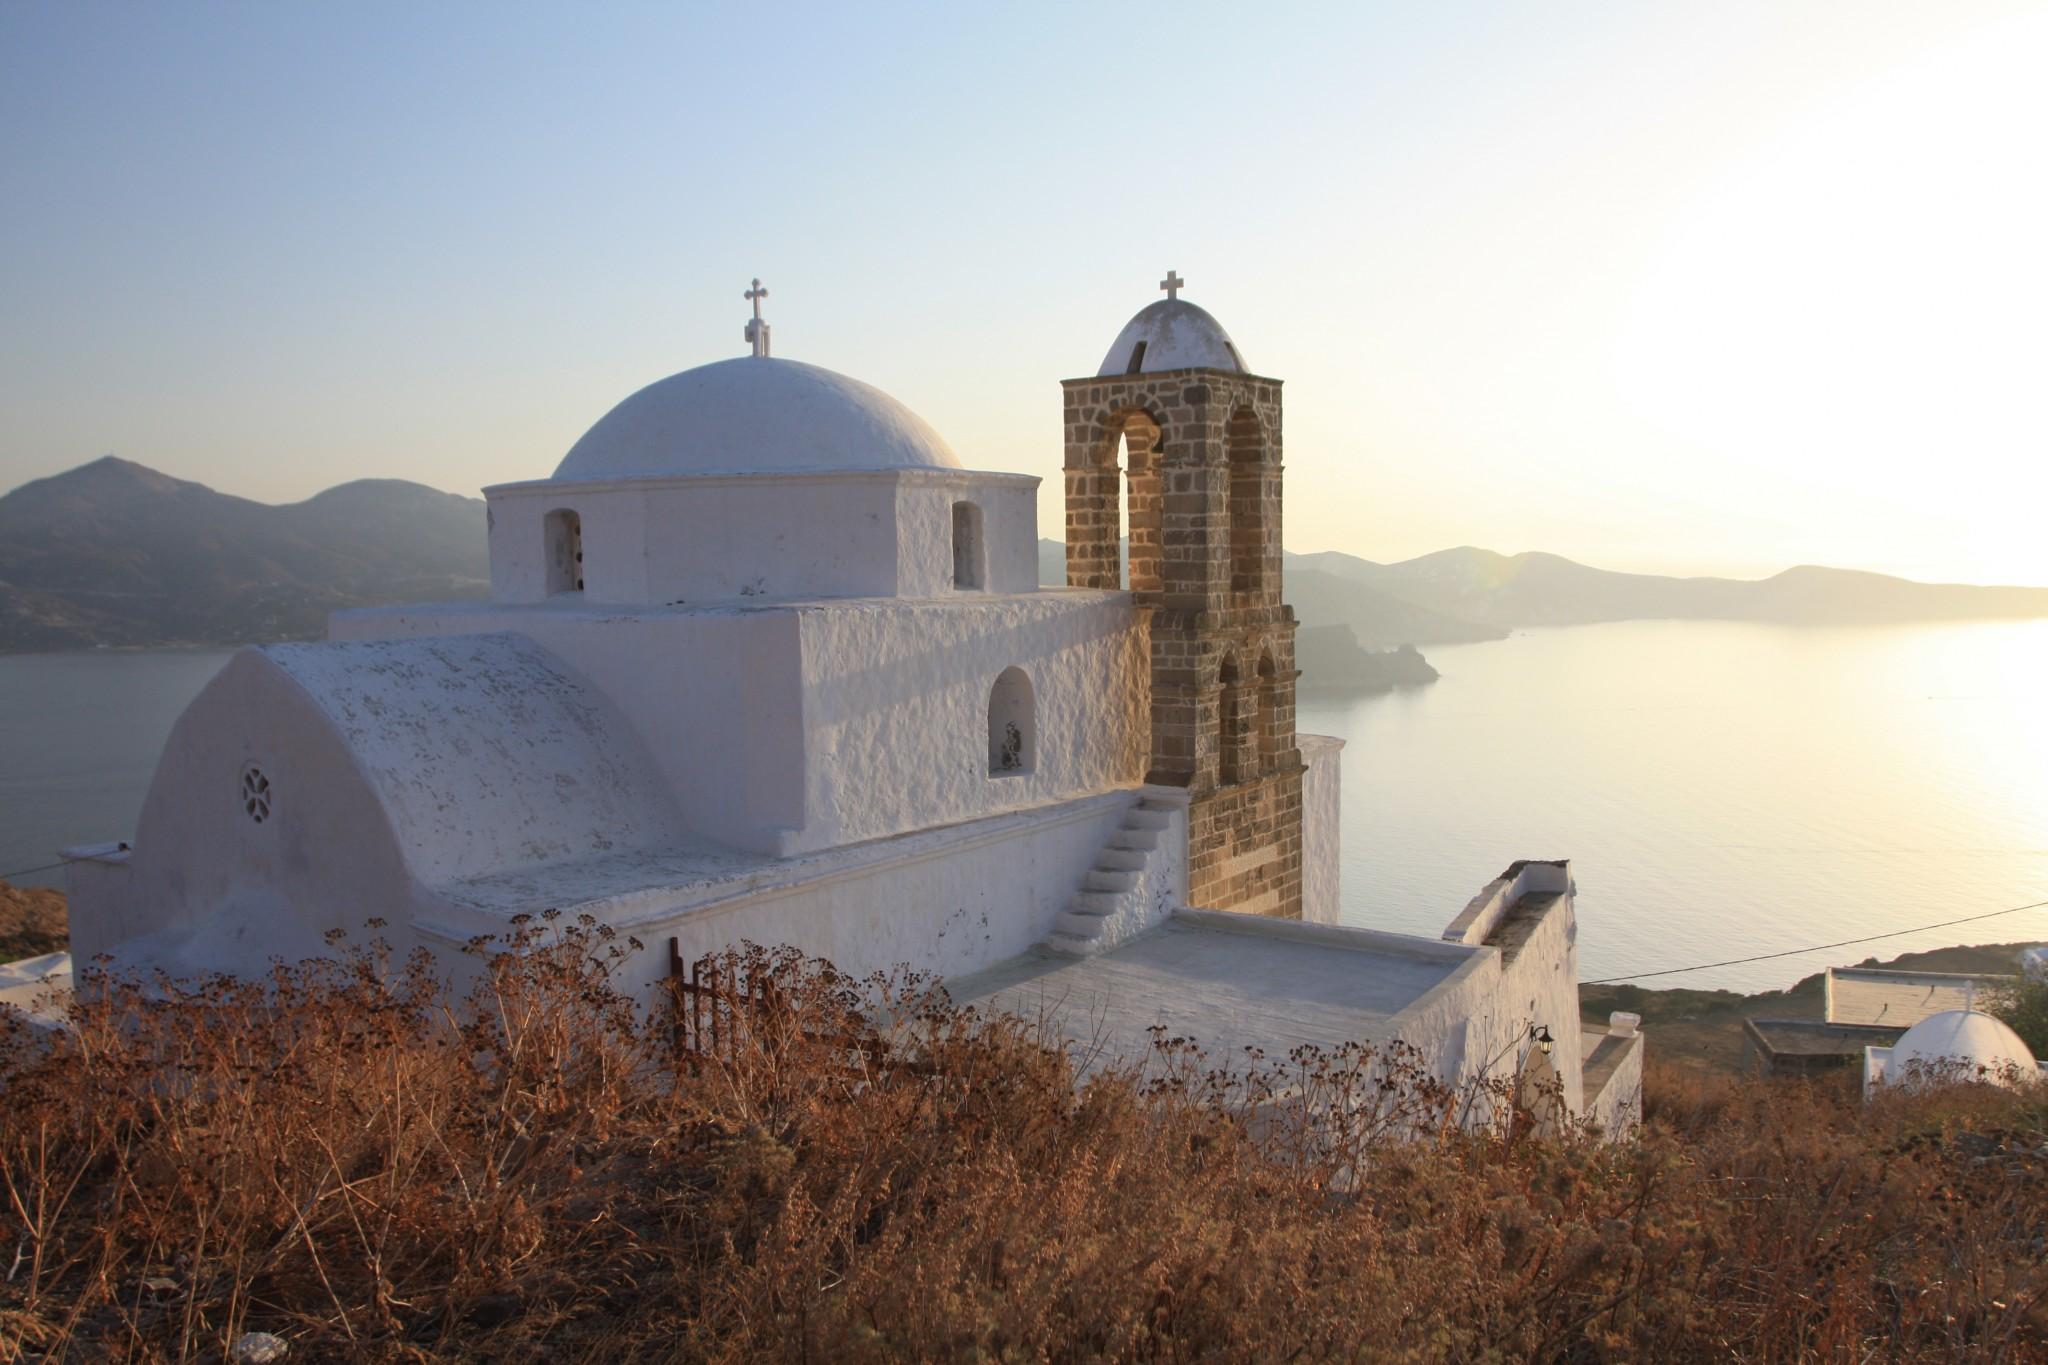 milots-travel-guide-ramblist-2.jpg